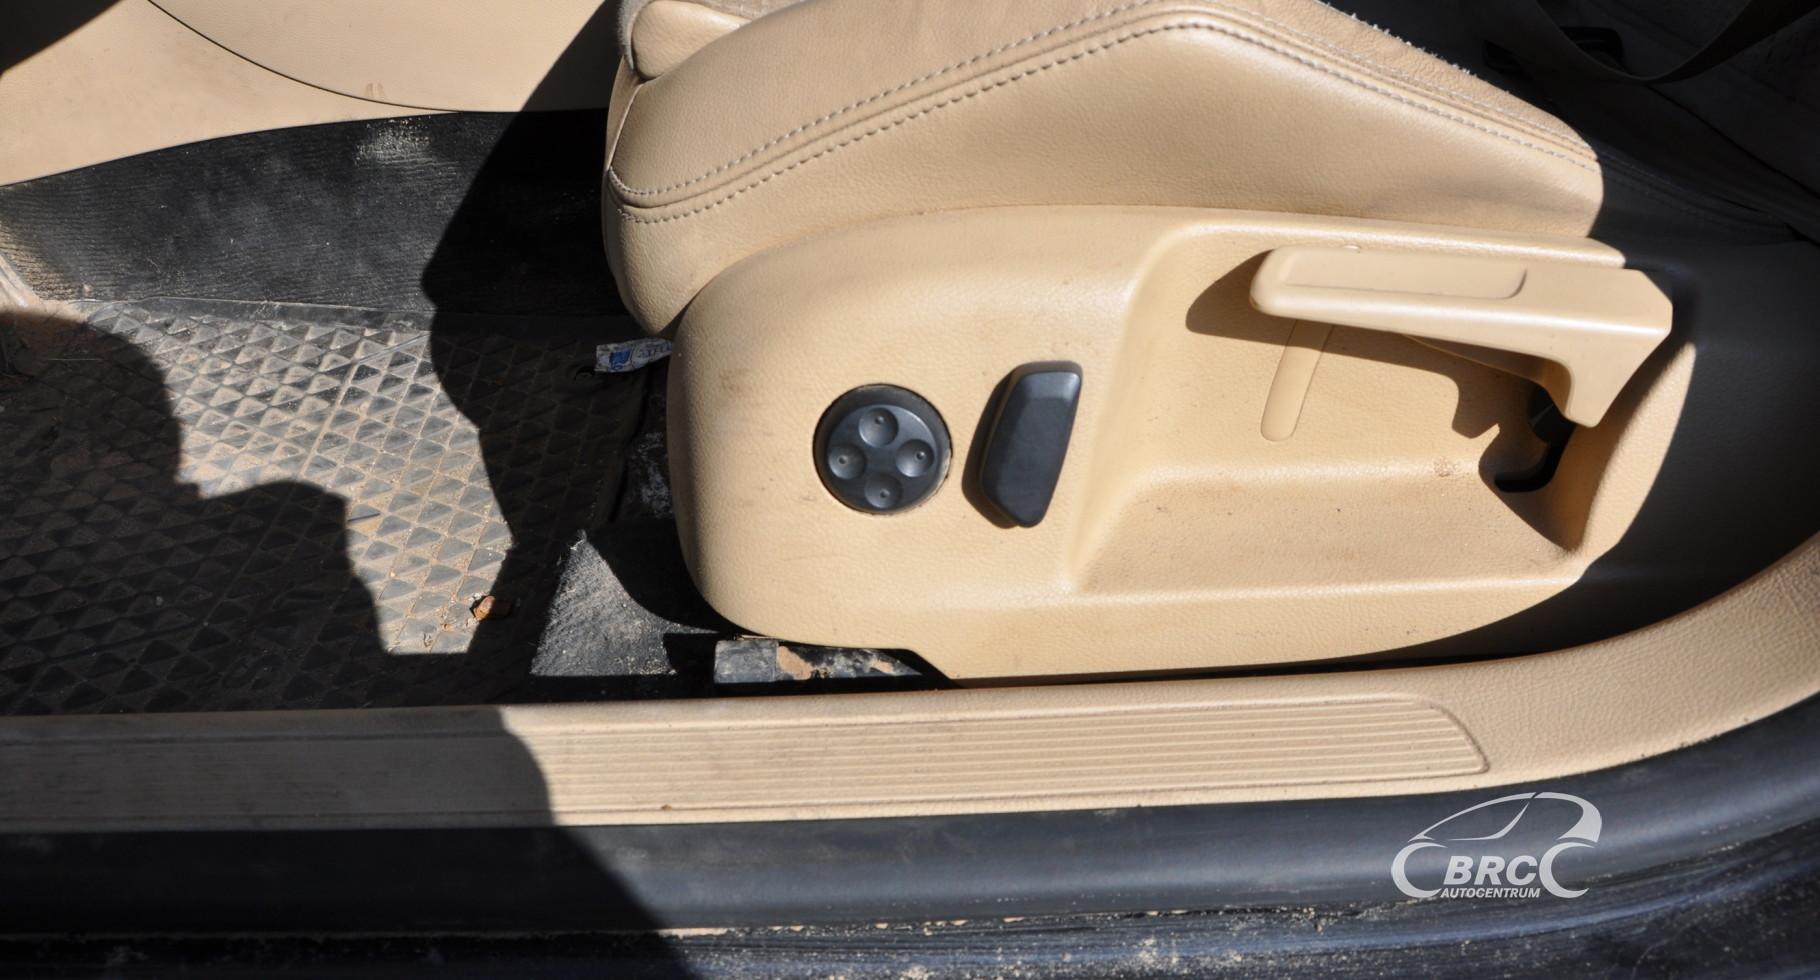 Volkswagen Passat 3.2V6 Highline 4Motion Automatas